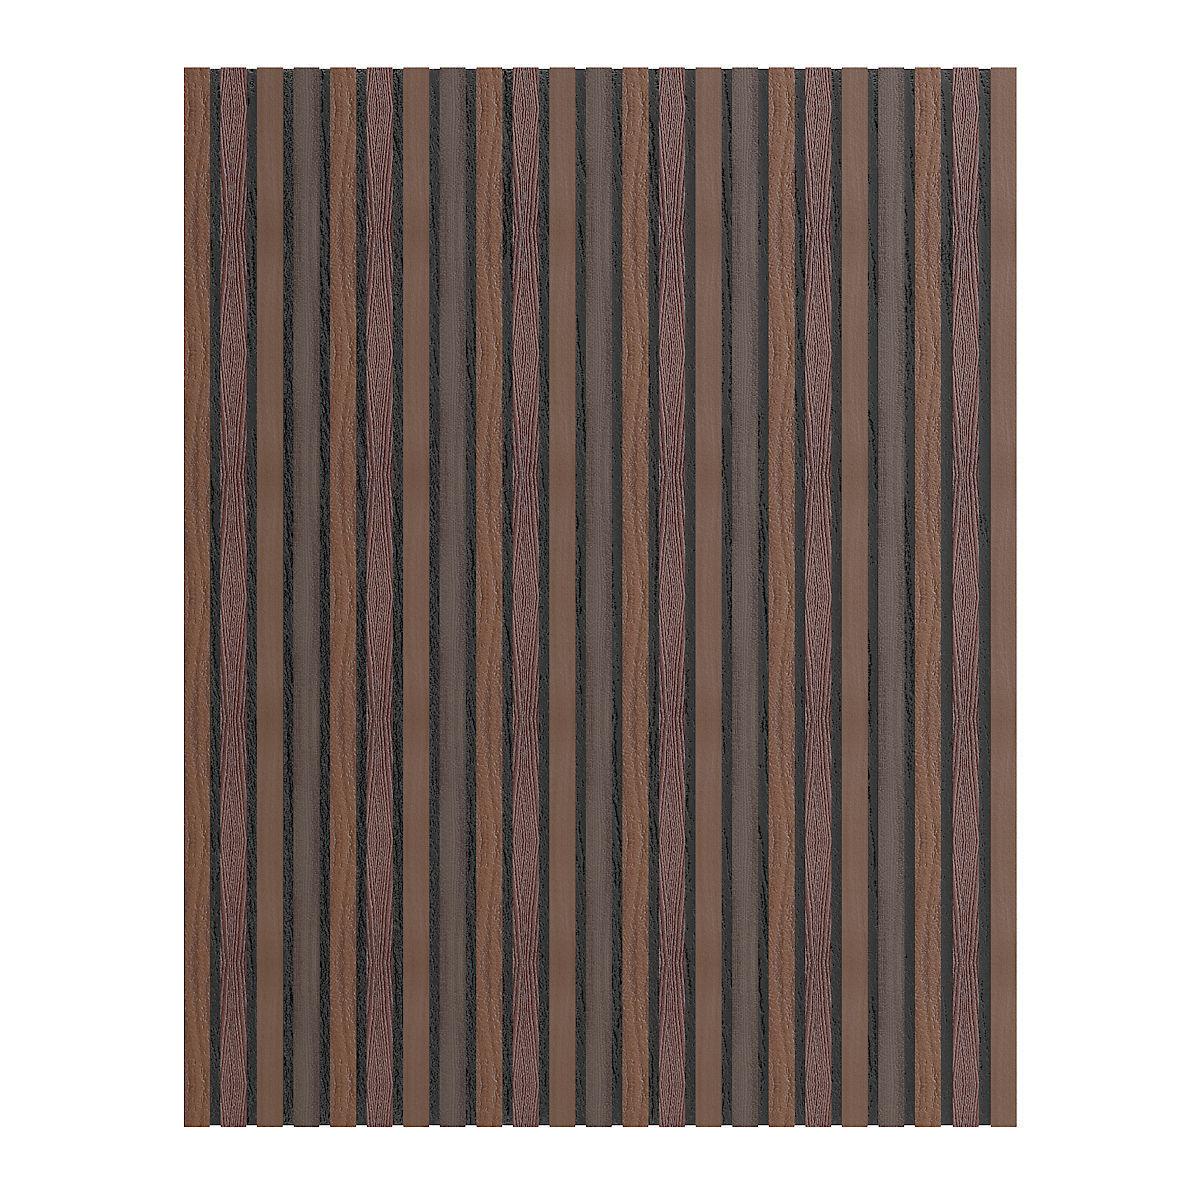 Dark Wood Wall Panel